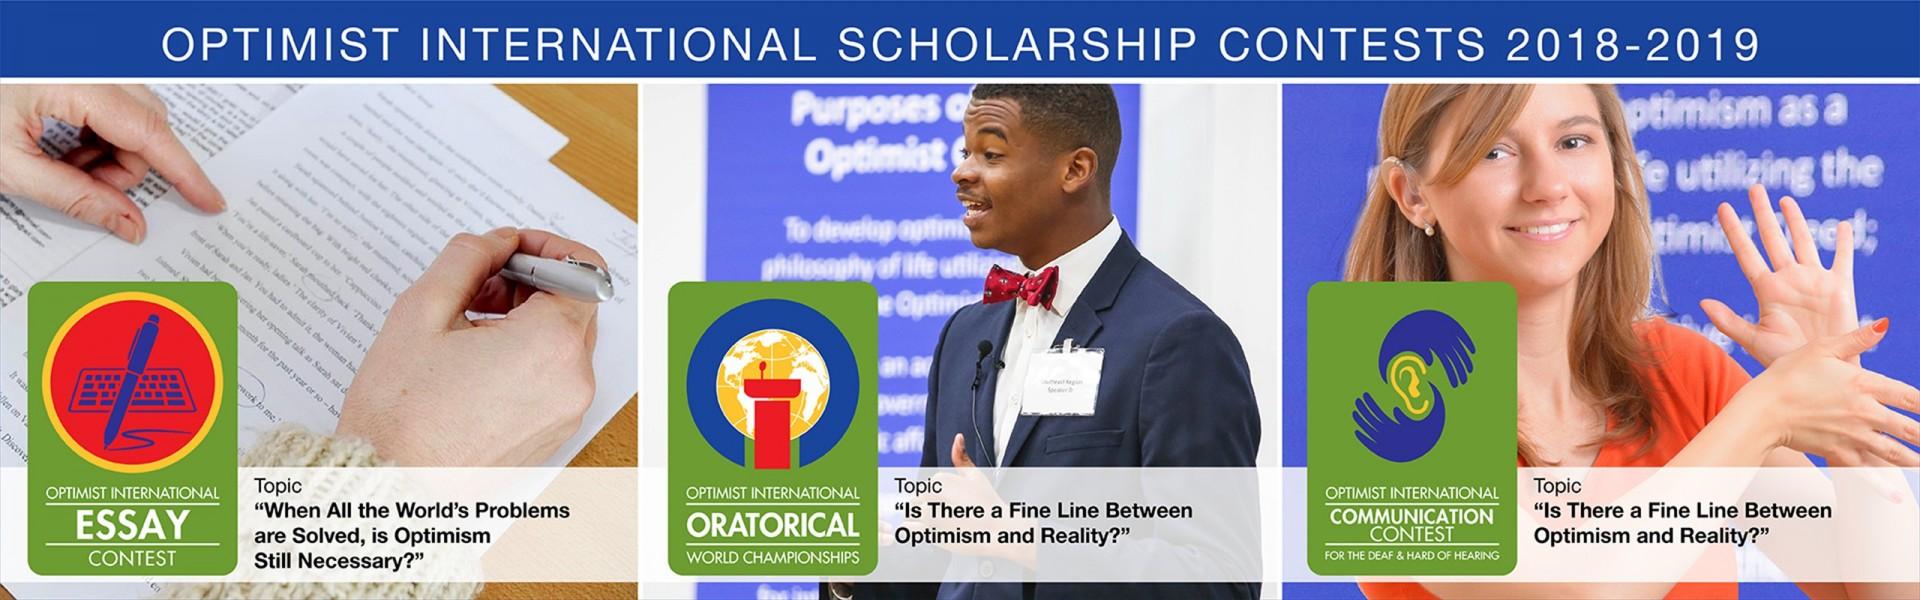 004 Essay Example Optimist International Contest Scholarships Webbanner Wondrous Oratorical Winners Rules 1920